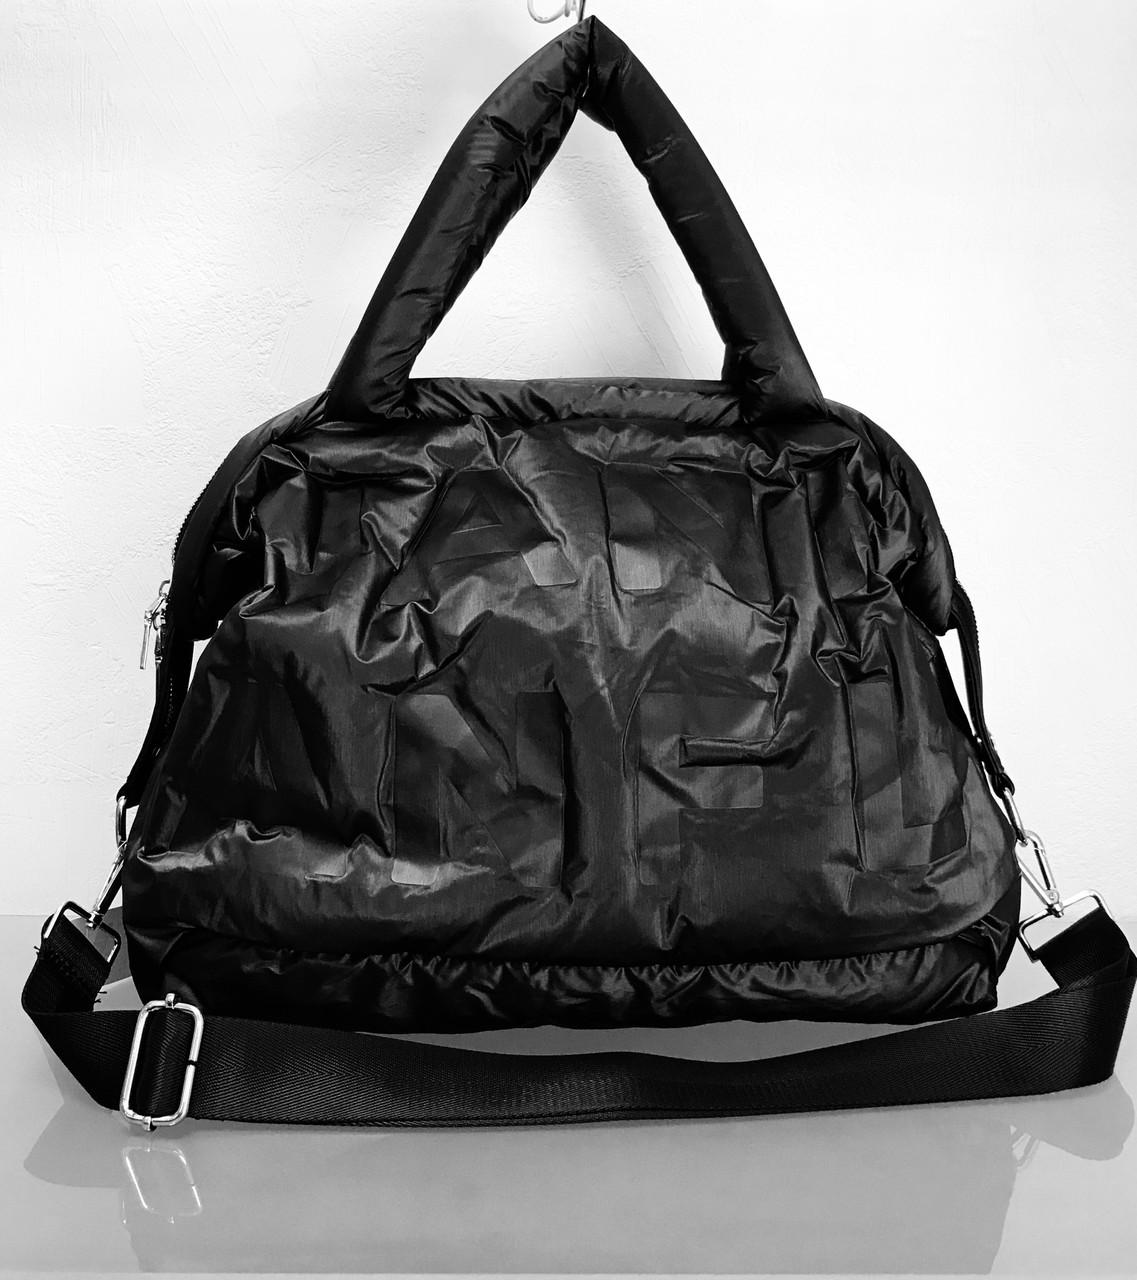 1a6805a69 Сумка бренд LUX копия чёрная стеганая текстиль - Интернет-магазин